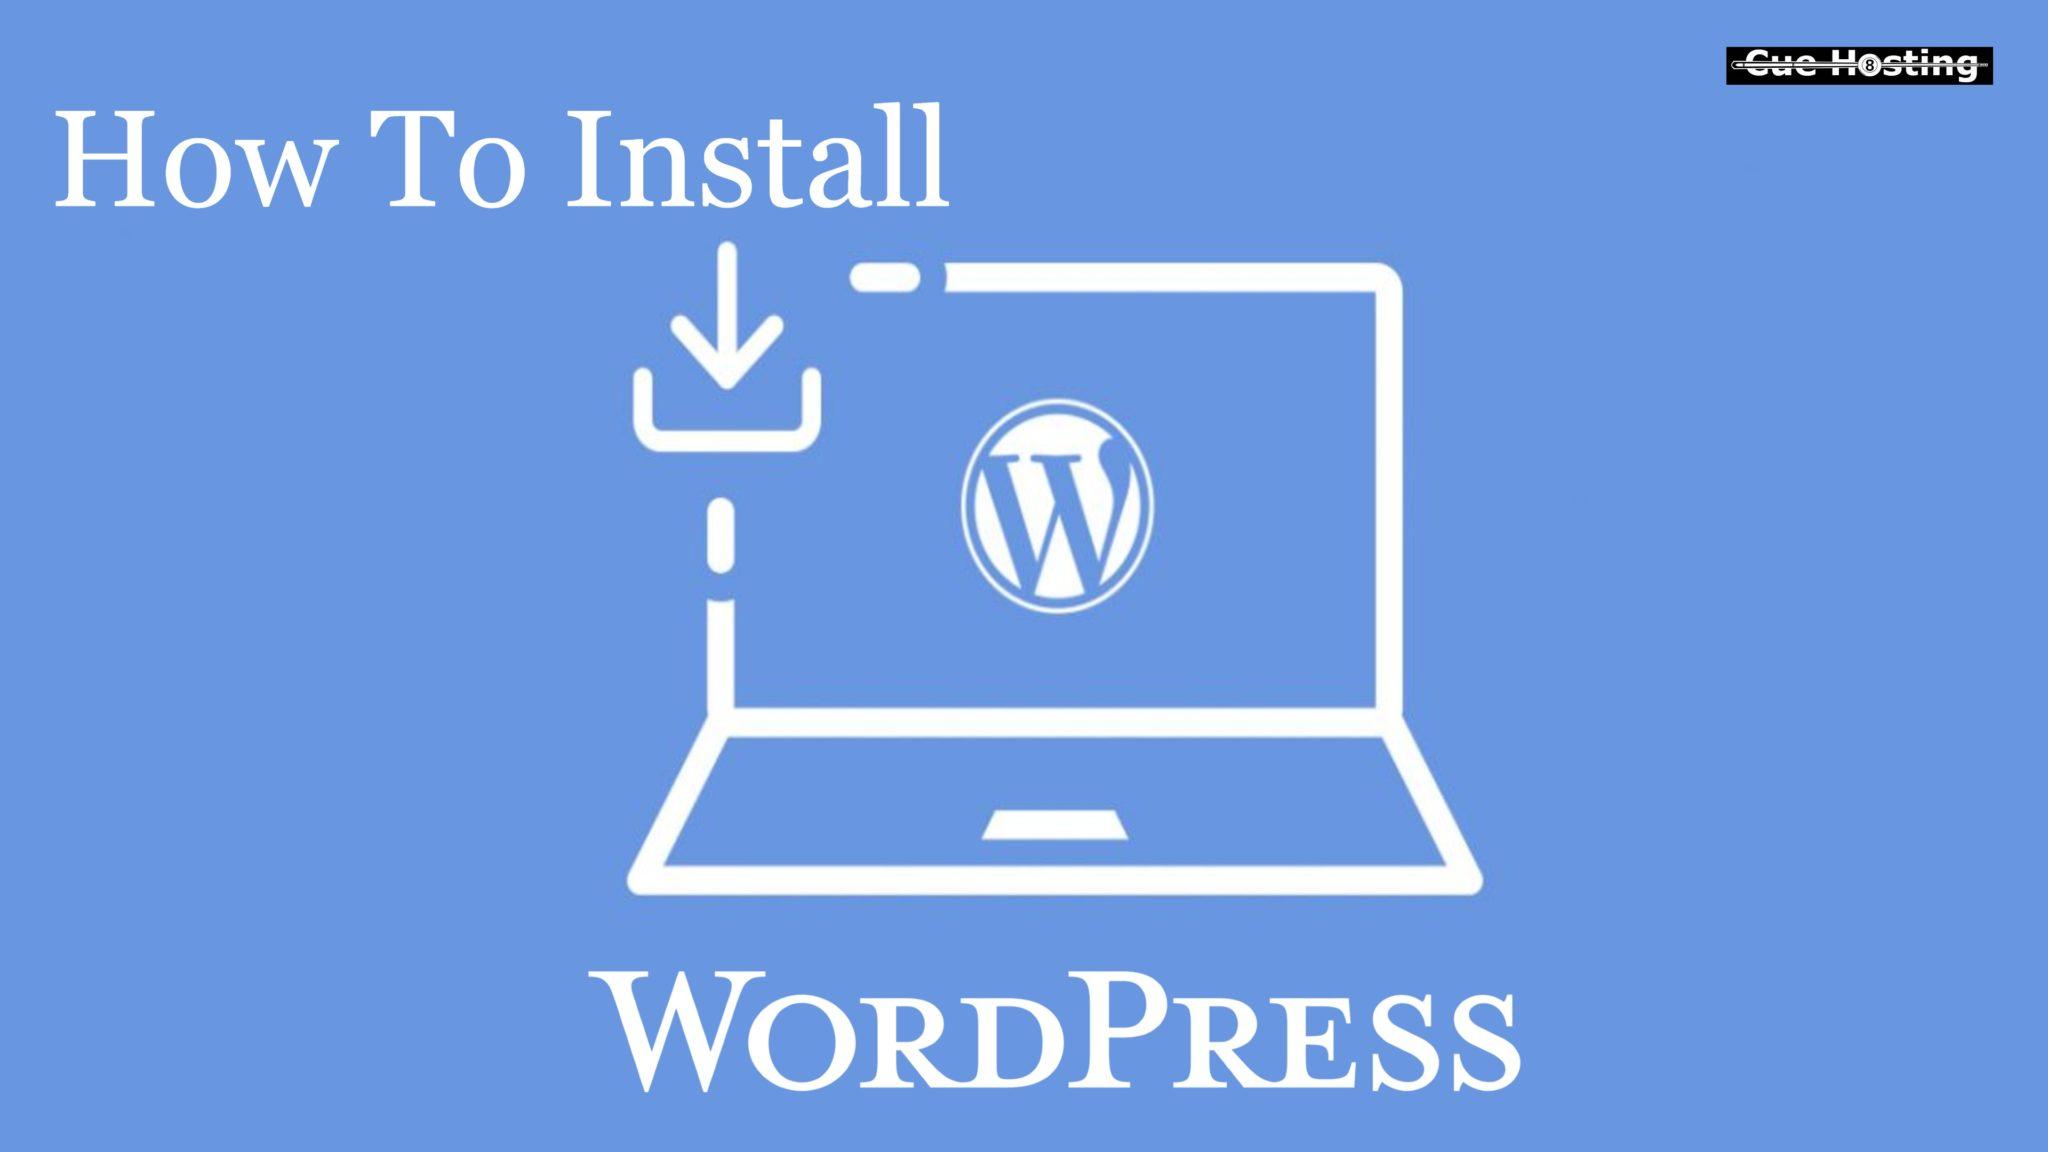 How to Install WordPress o Ubuntu